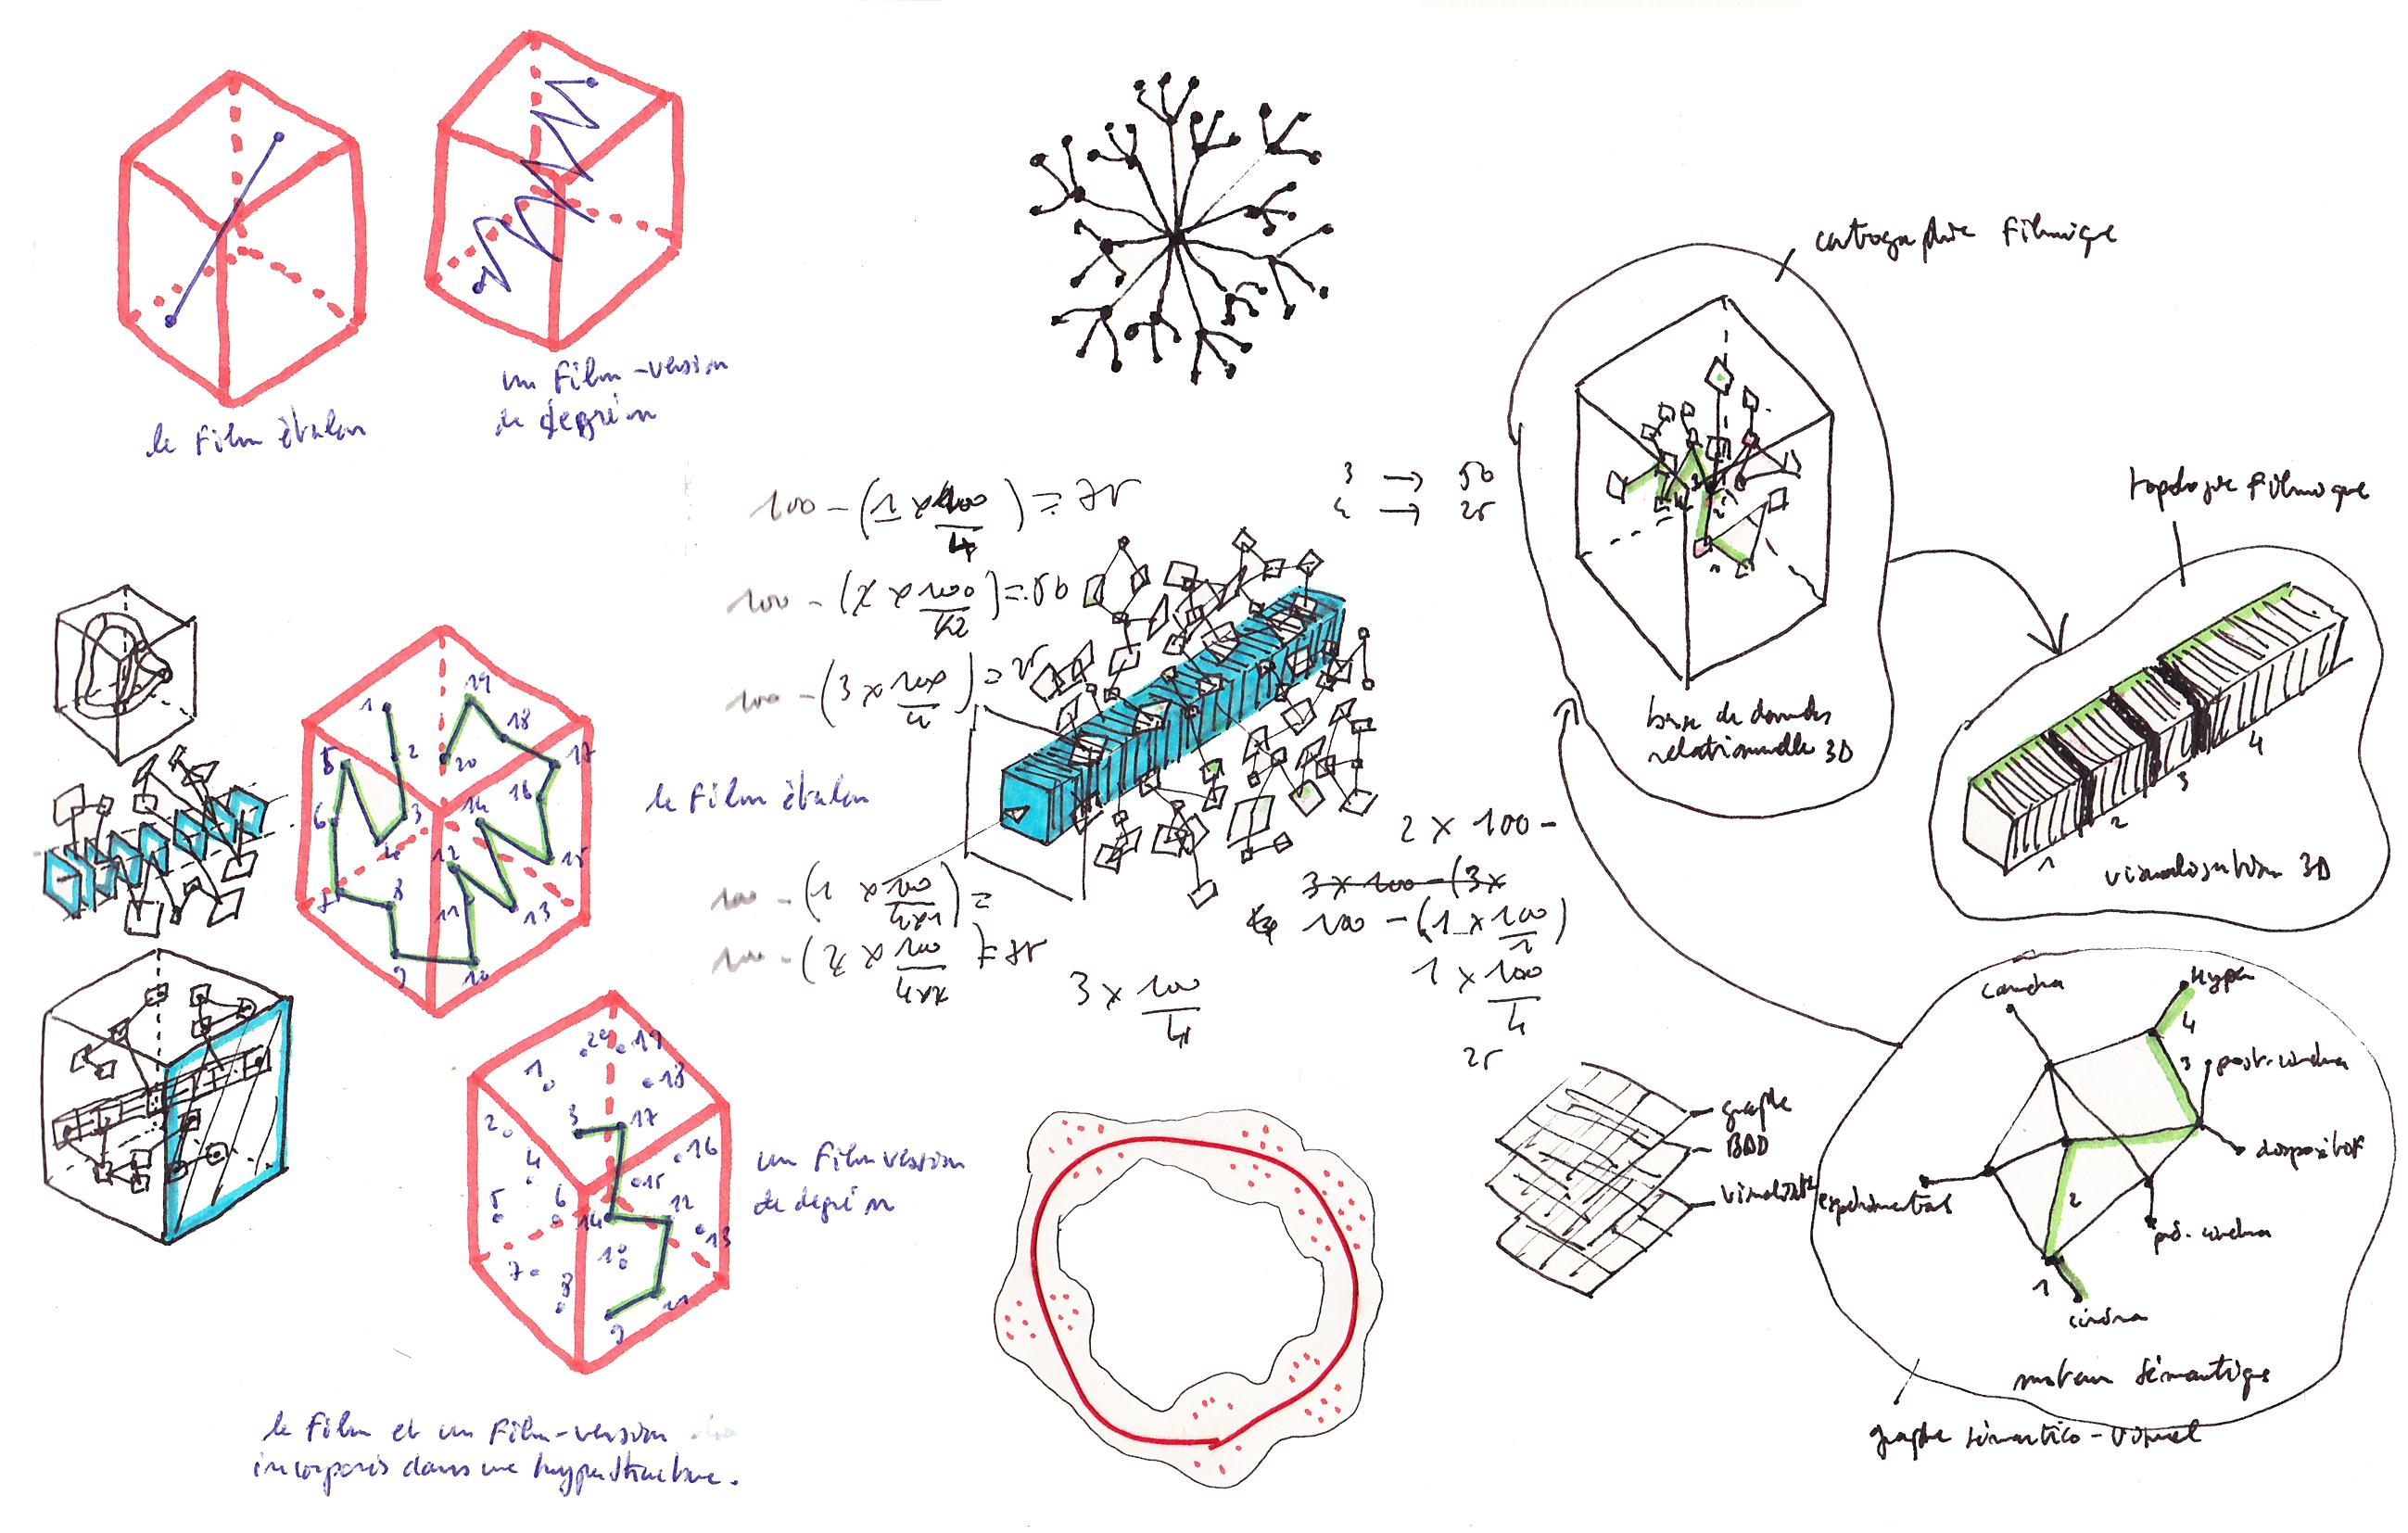 montage-illustration-mg-4